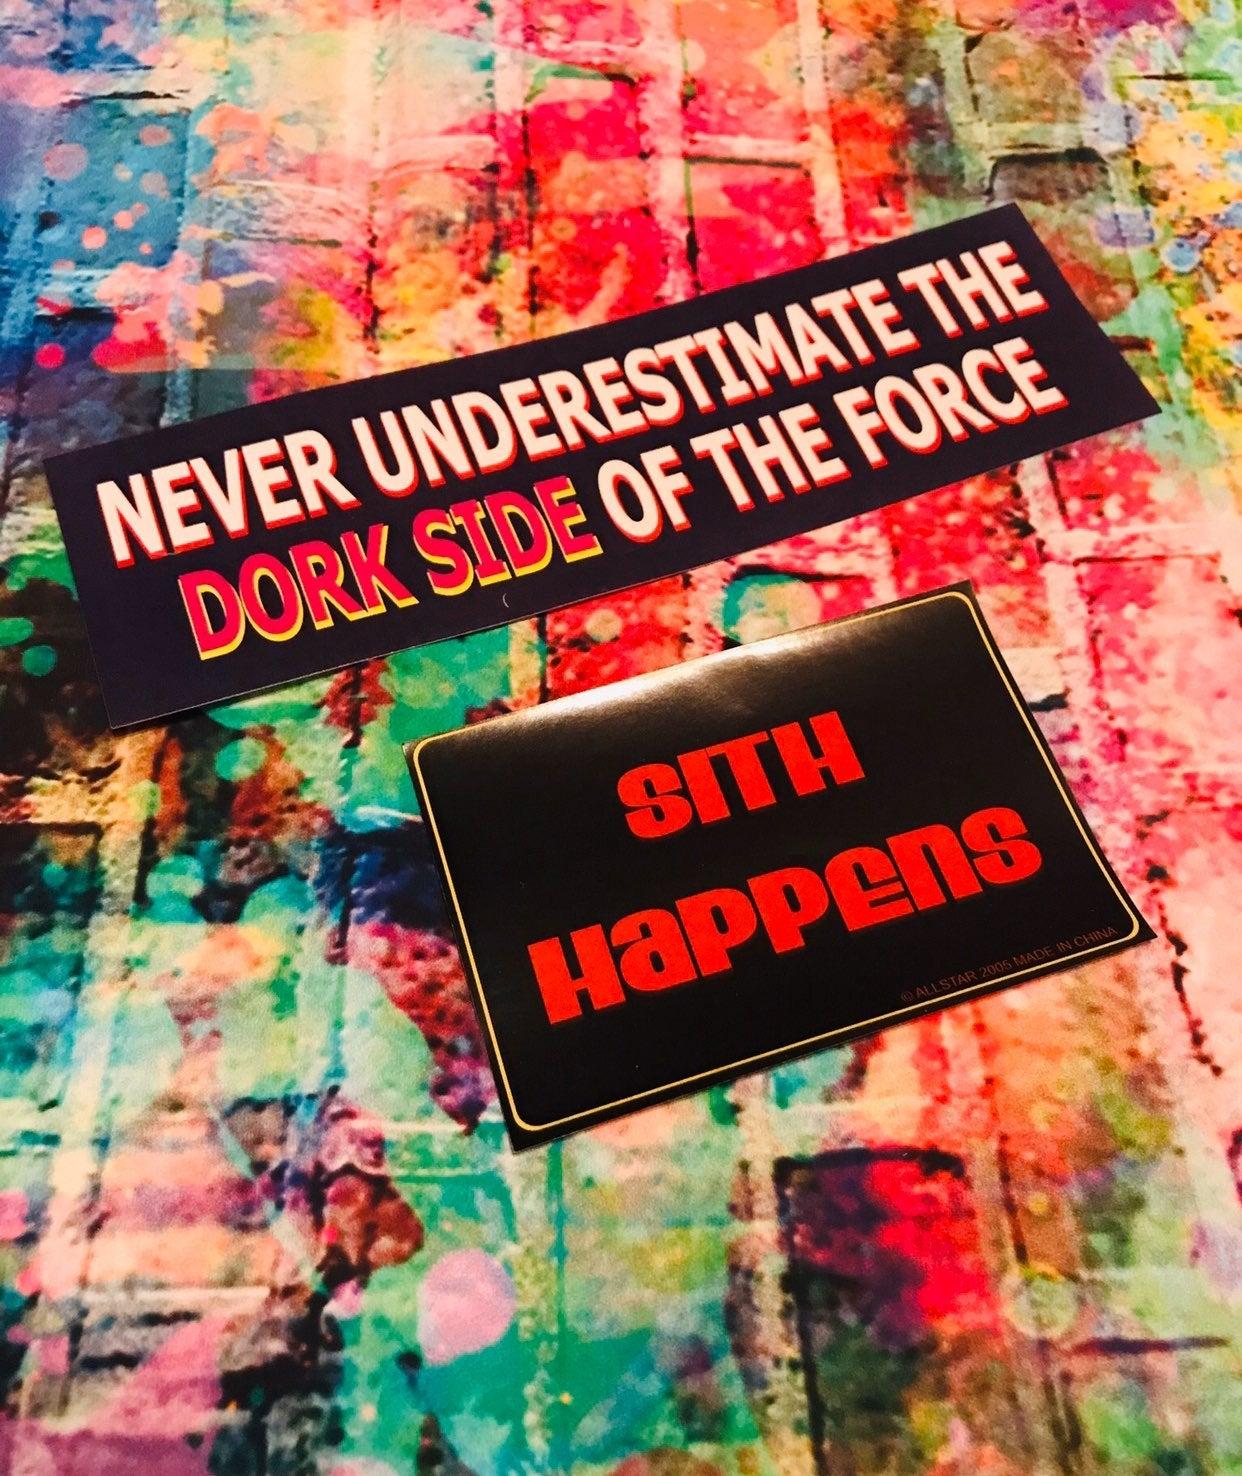 Star Wars Theme Dorkside Sith Stickers